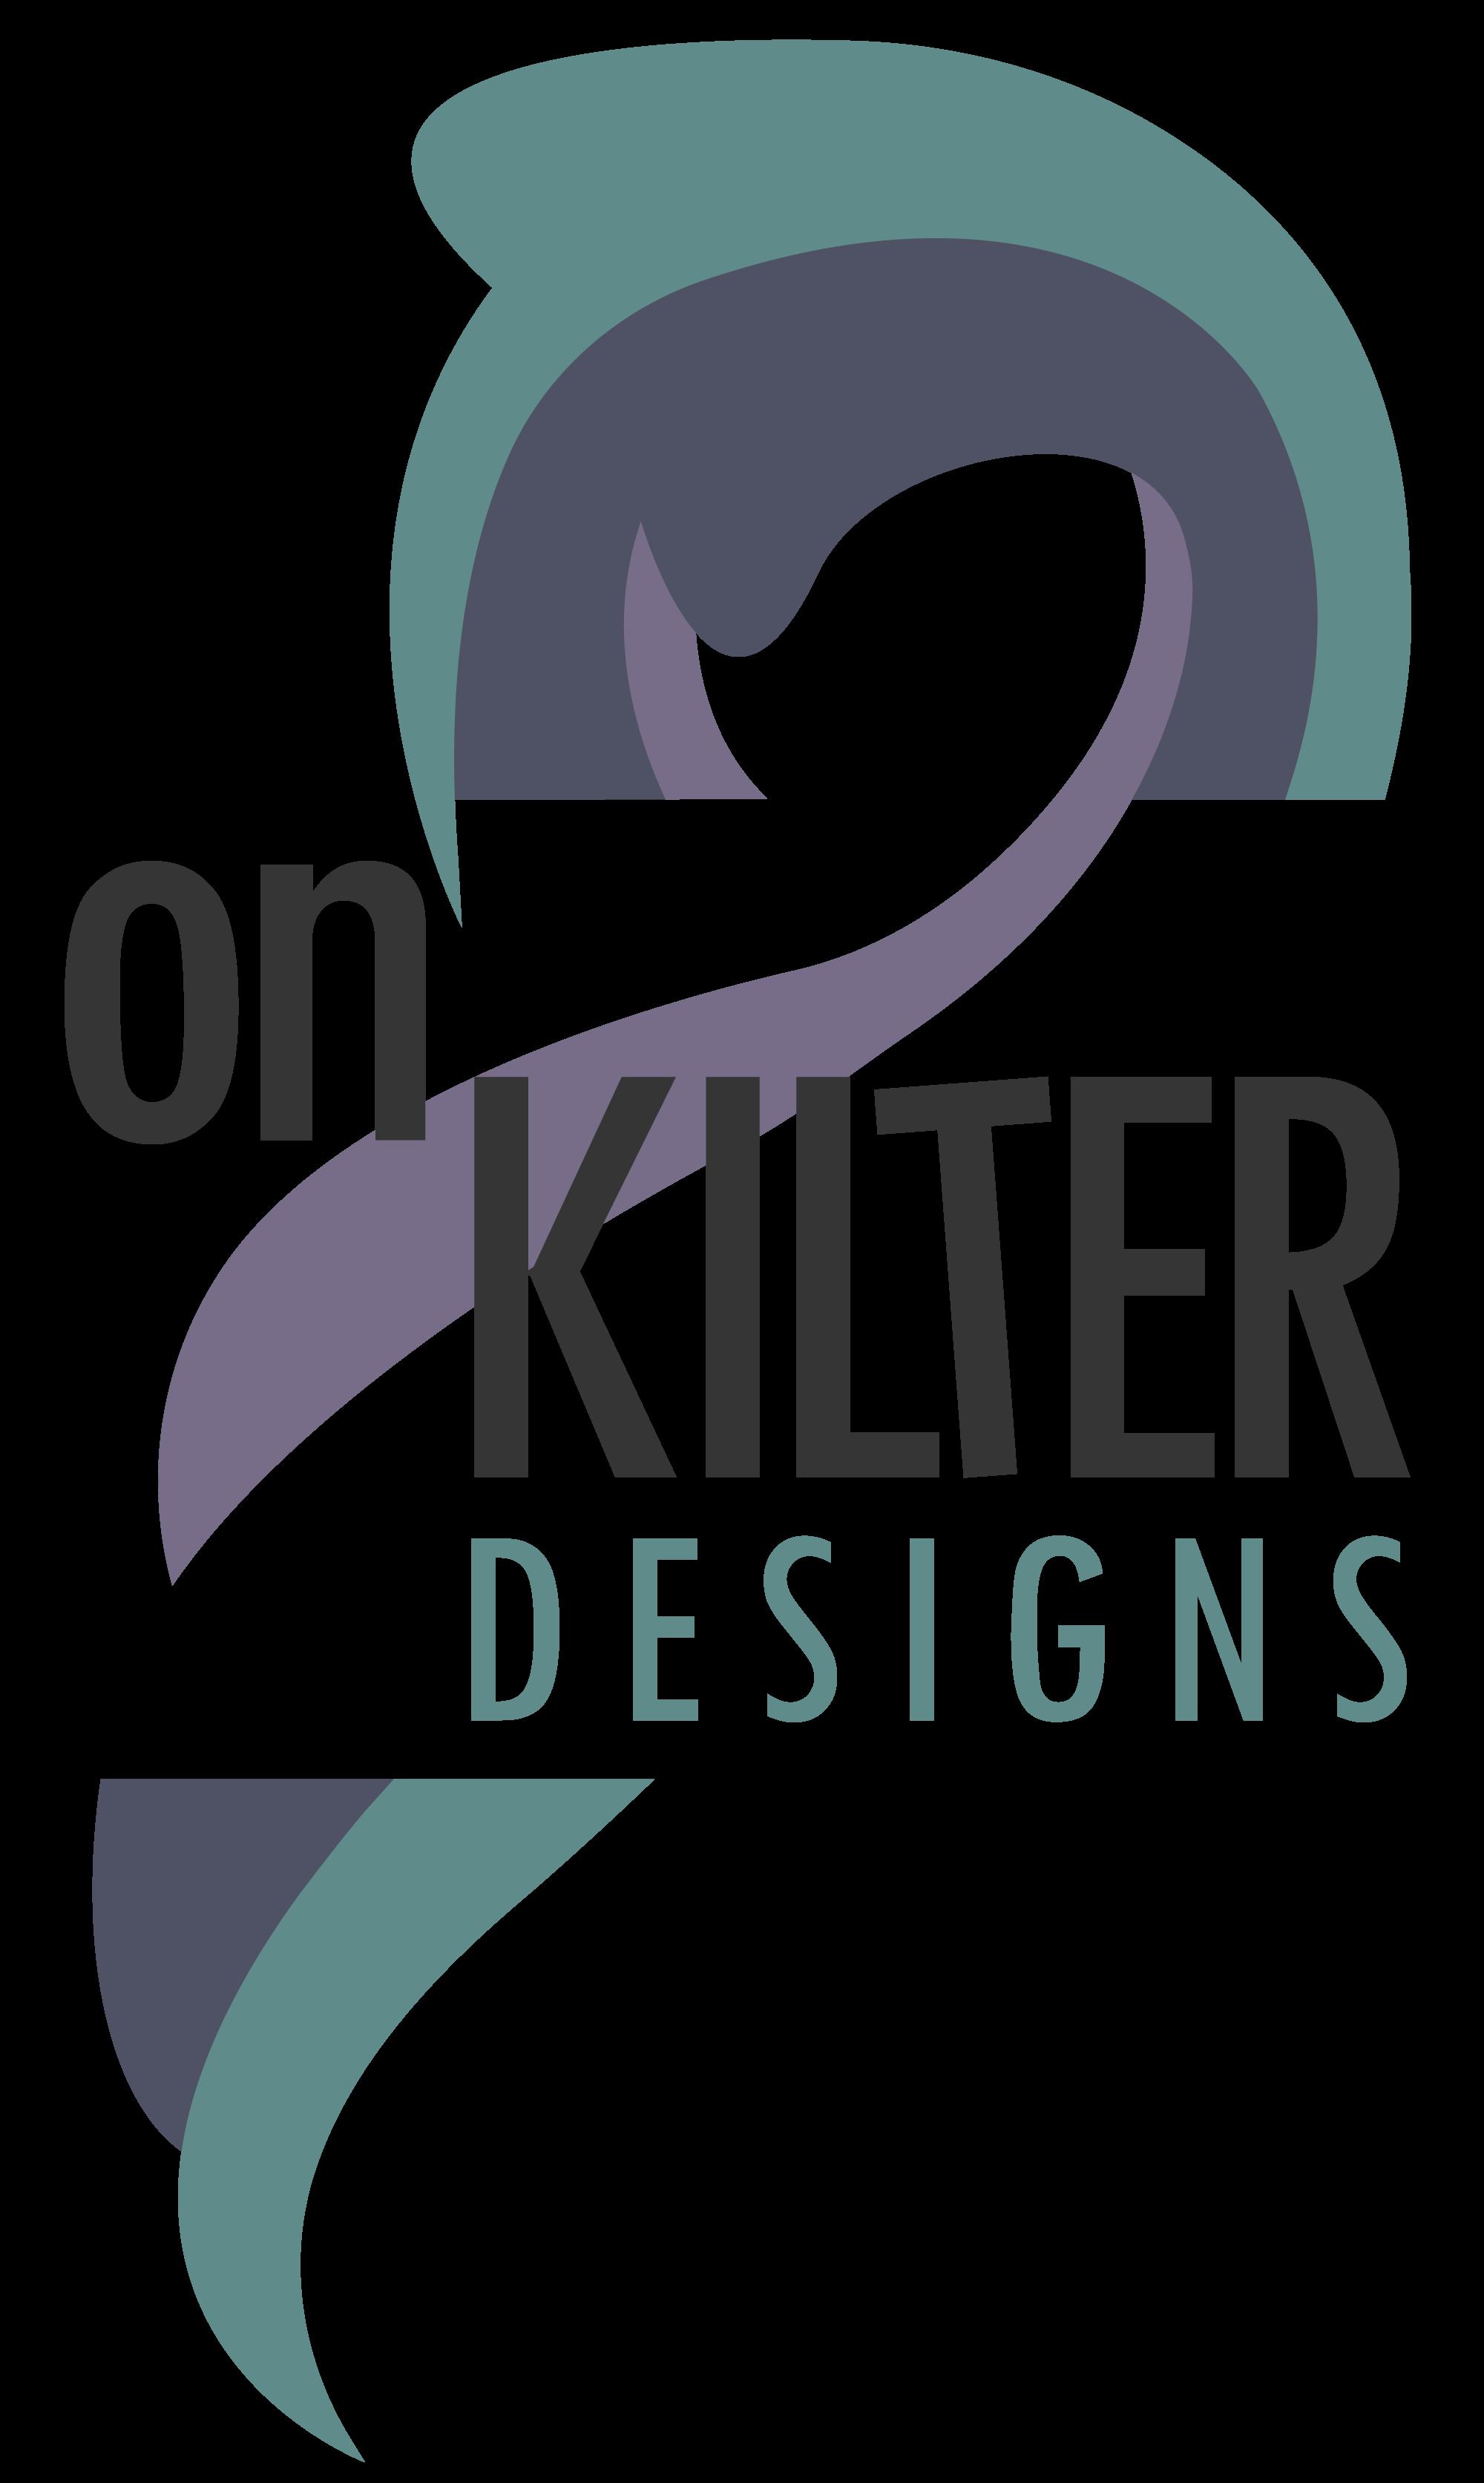 Mobile Alabama Graphic Logo Design